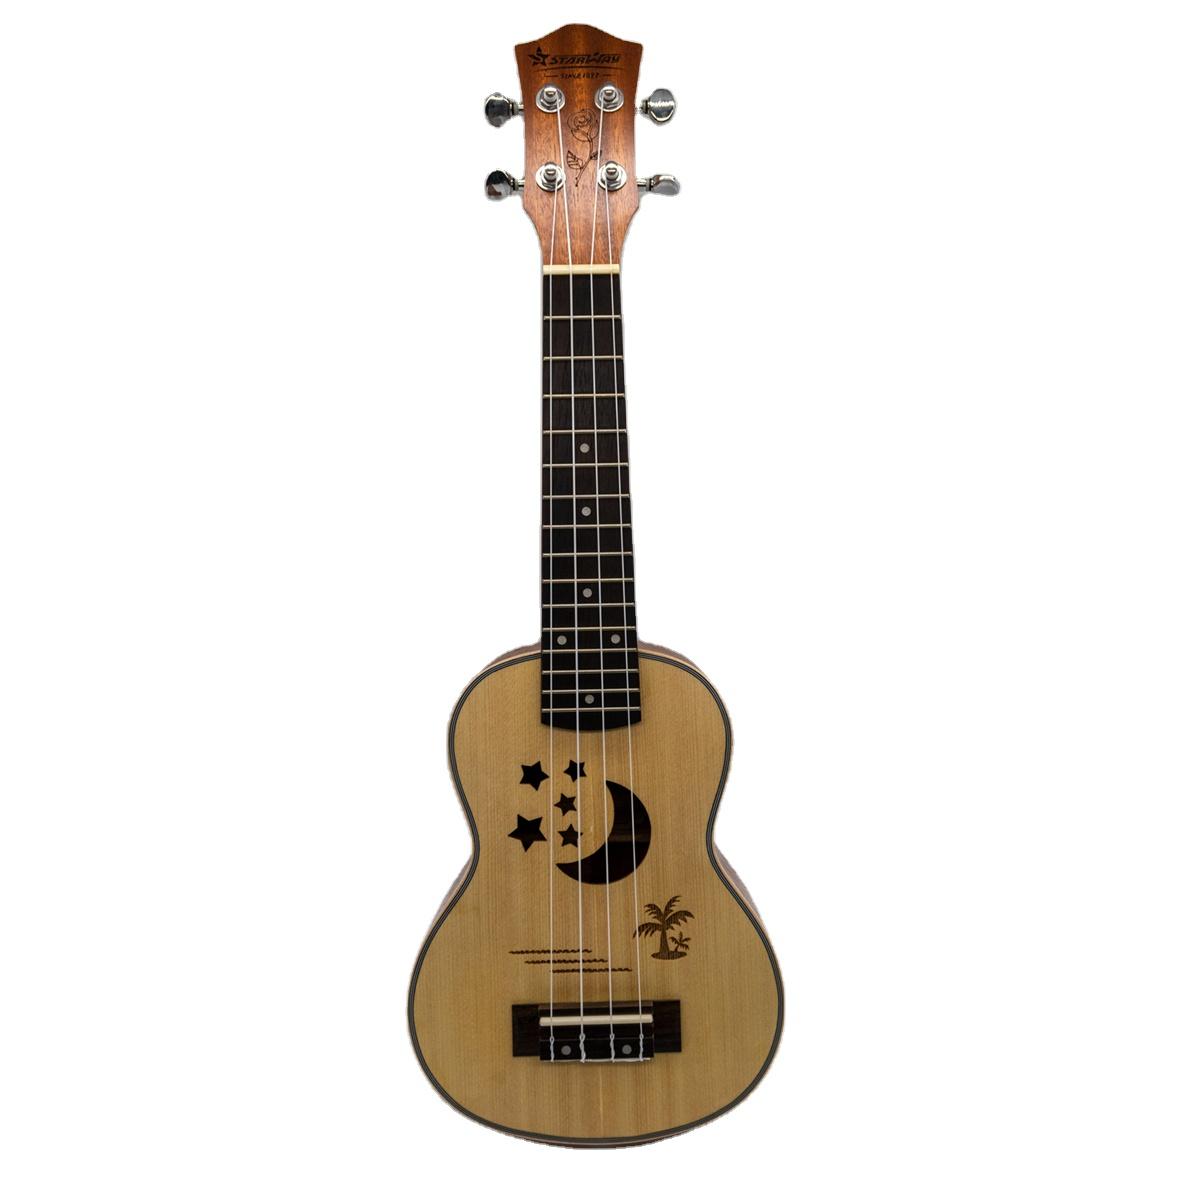 Licht Gewicht Custom gitarre Wahre colorsBaritone Solide Mahagoni Ukulele